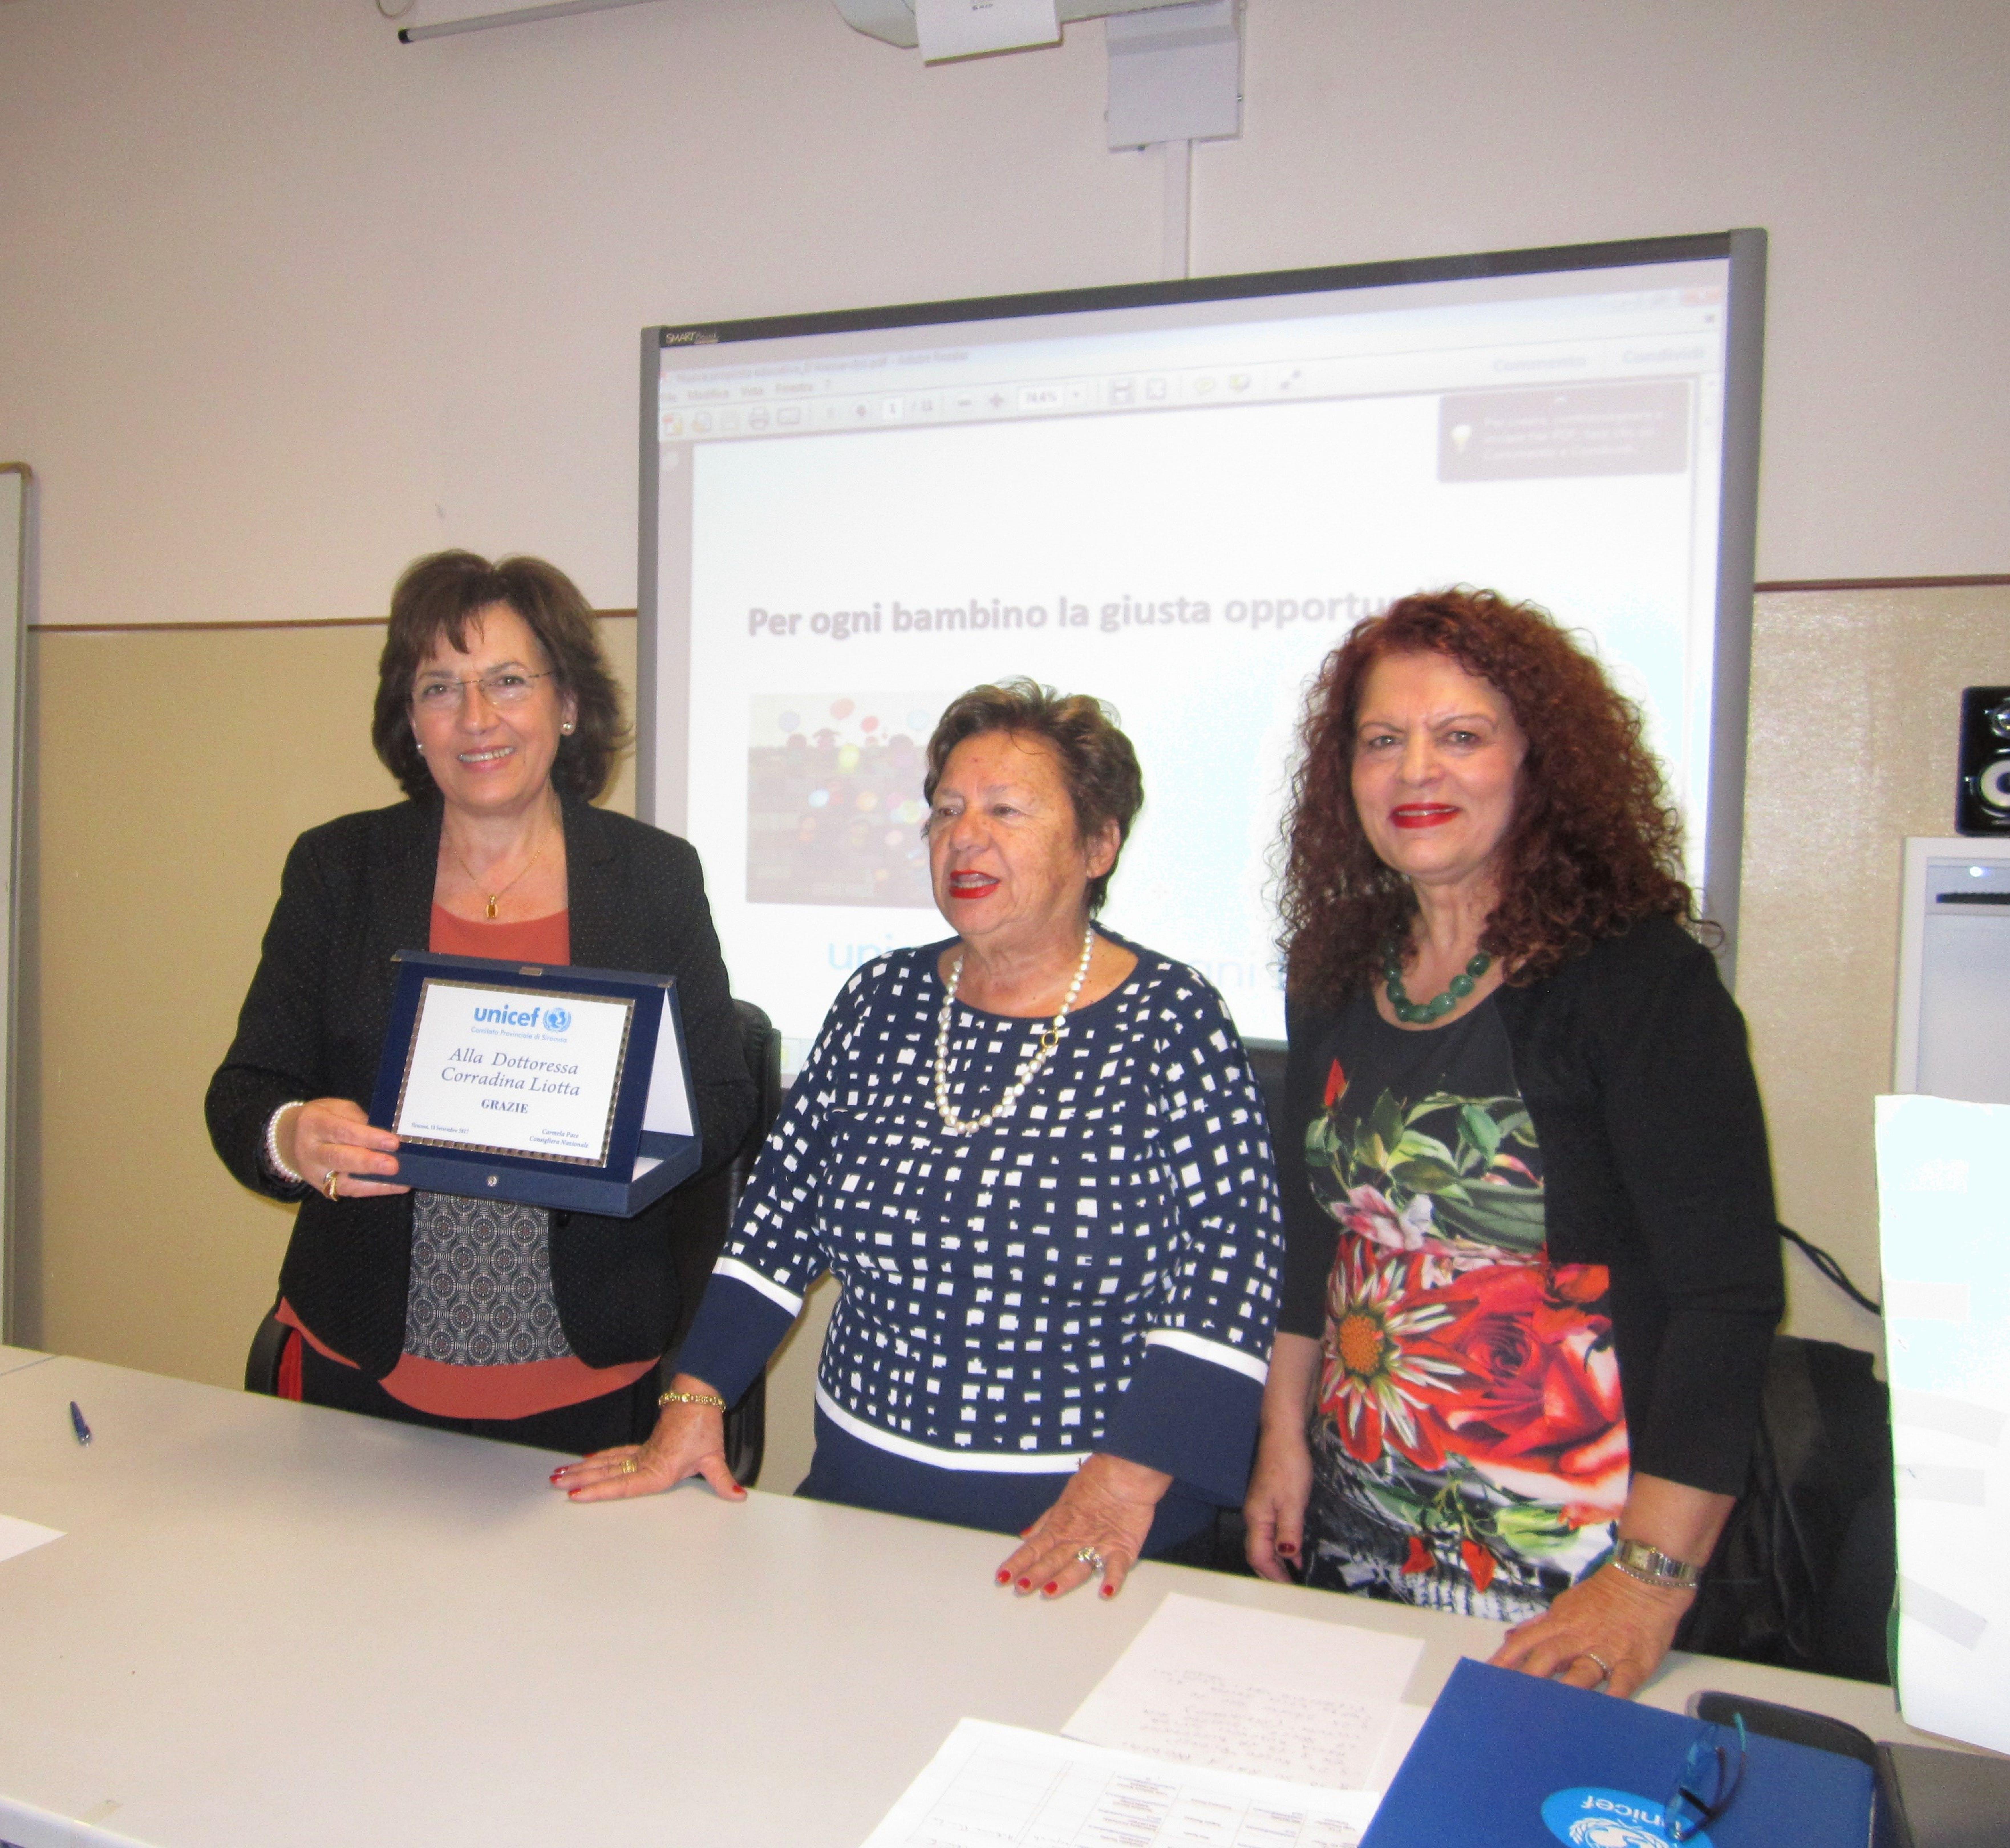 Corradina Liotta, Carmela Pace e Angelica Romano